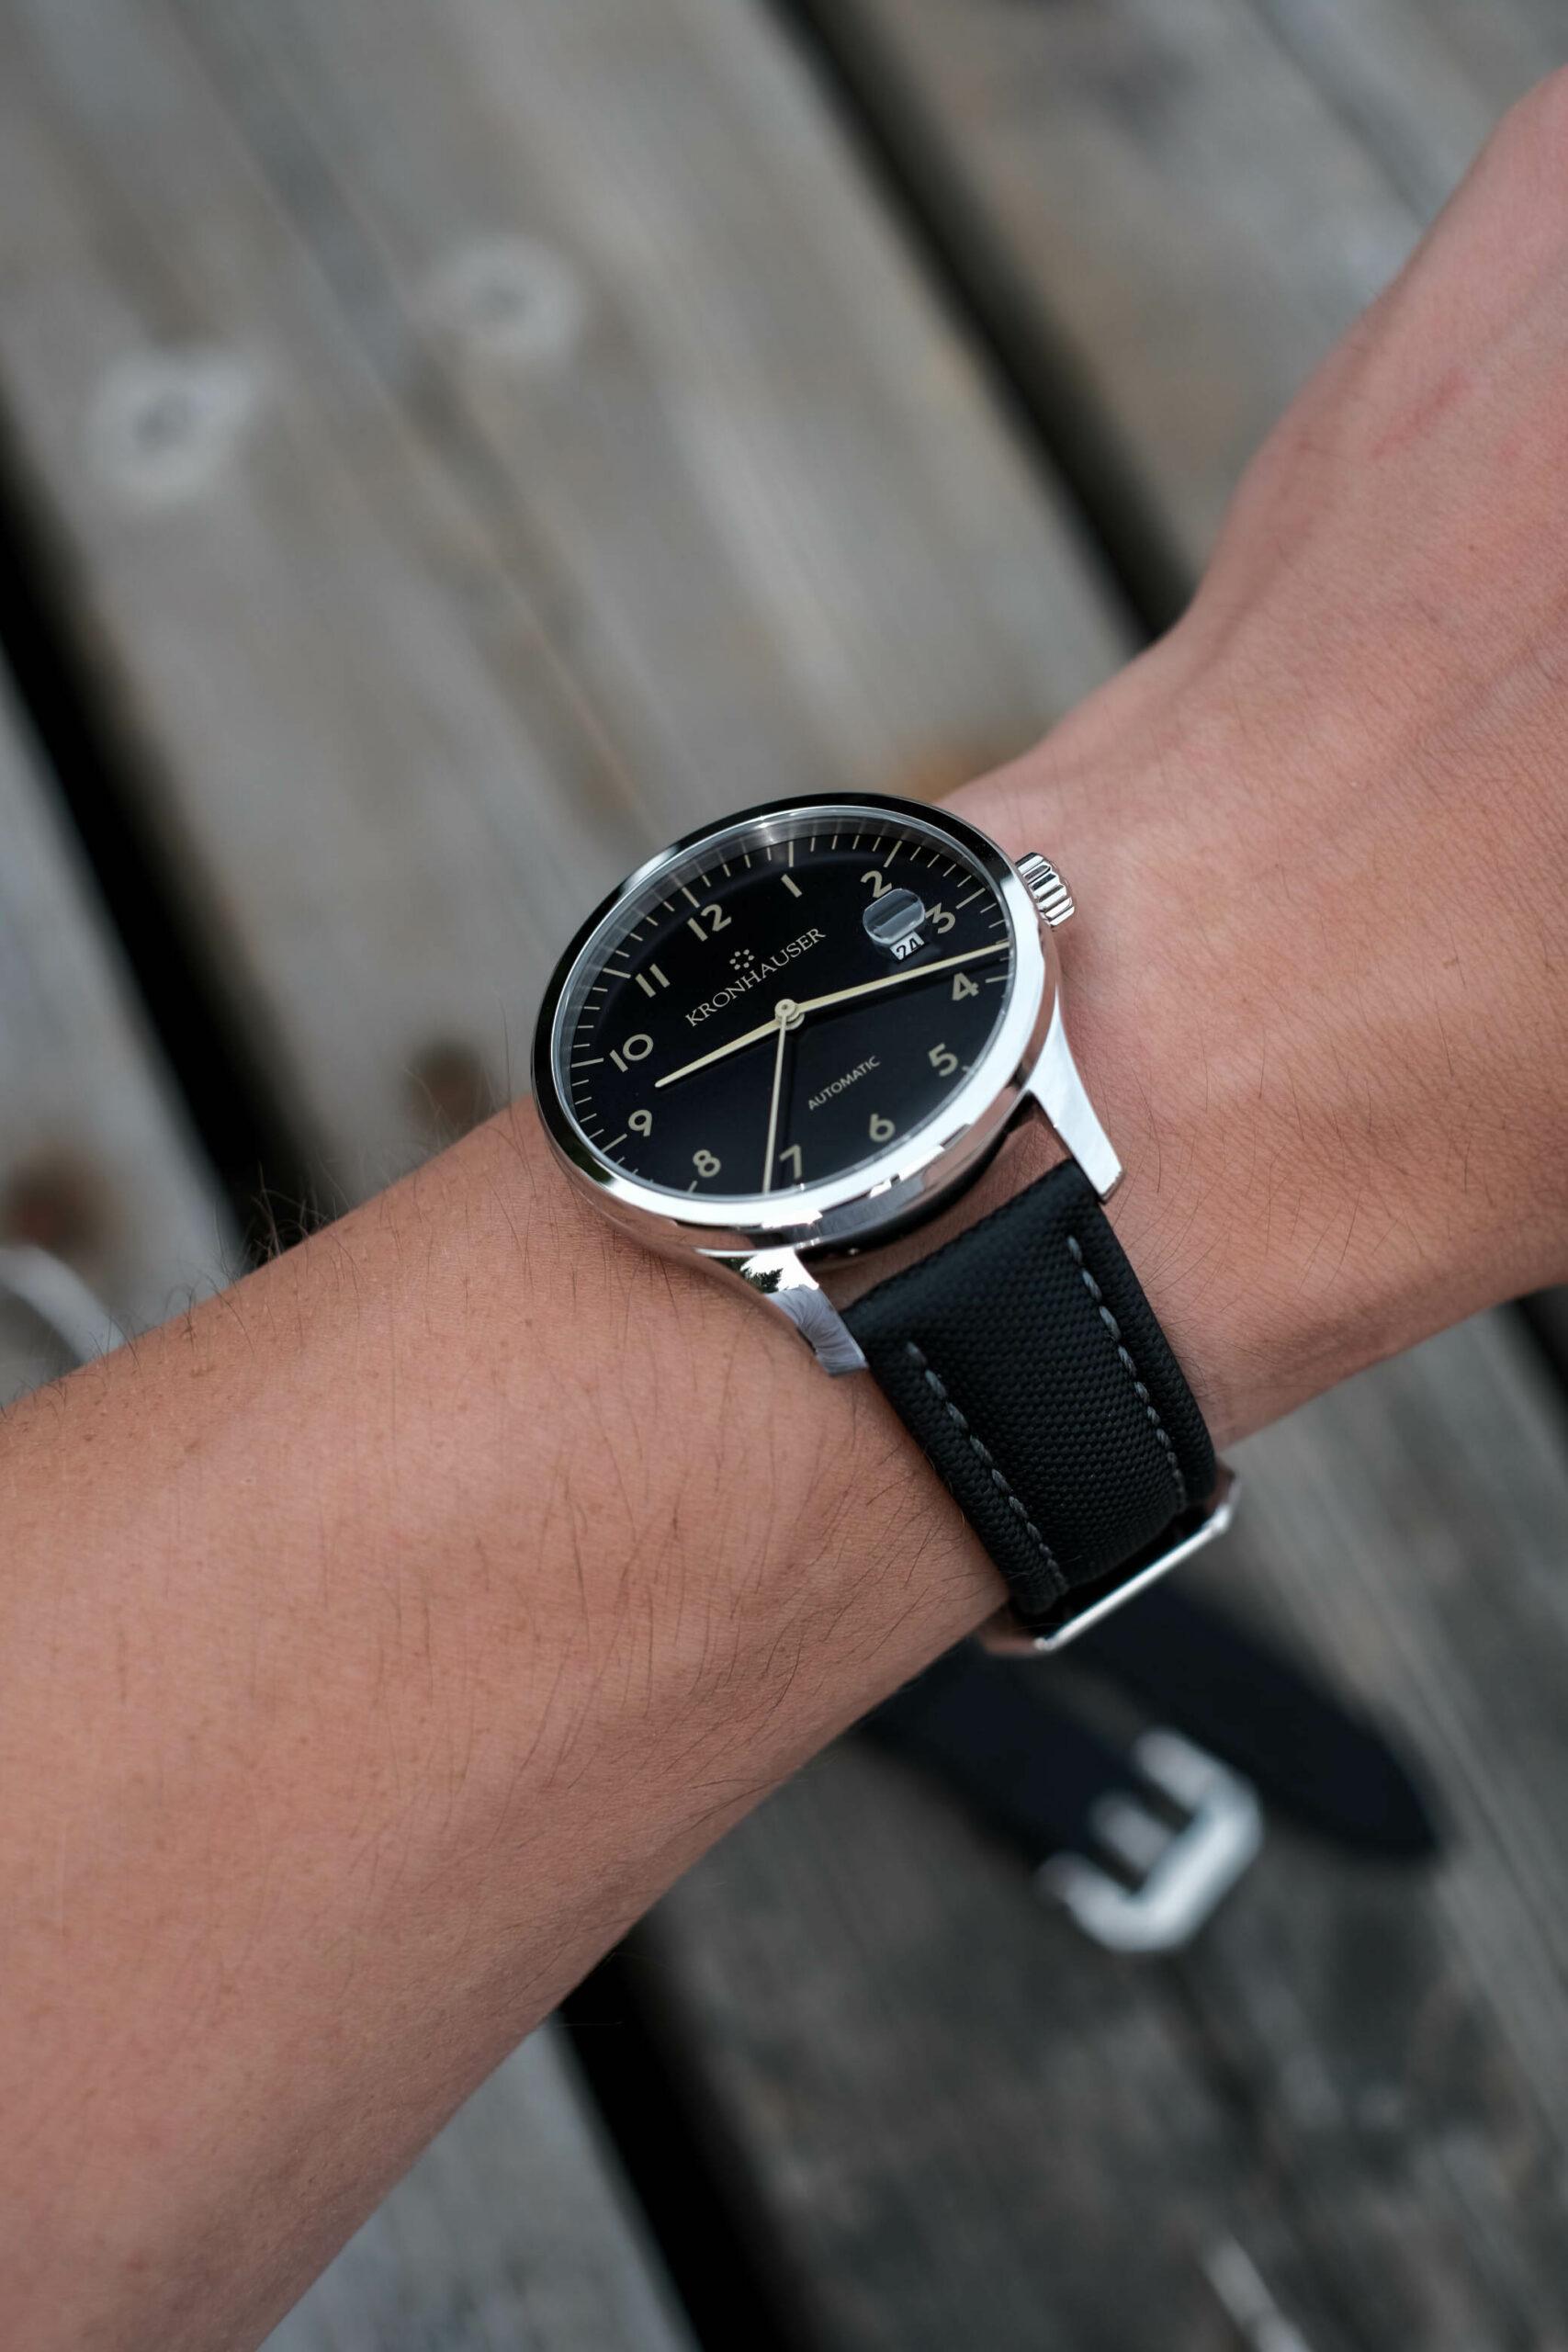 Artem comfort on wrist